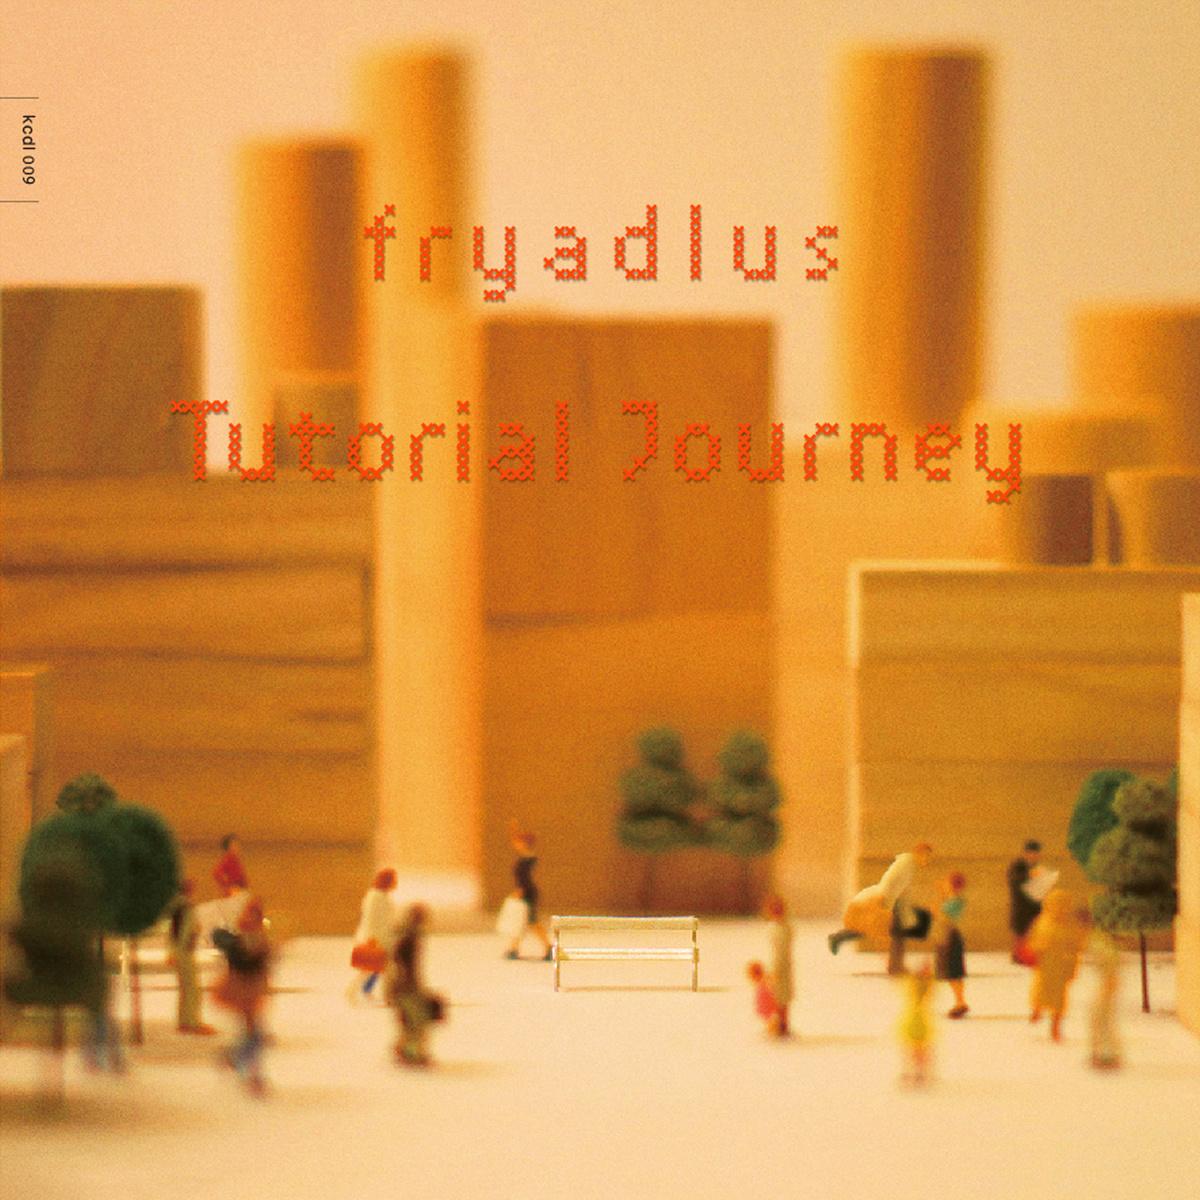 fryadlus